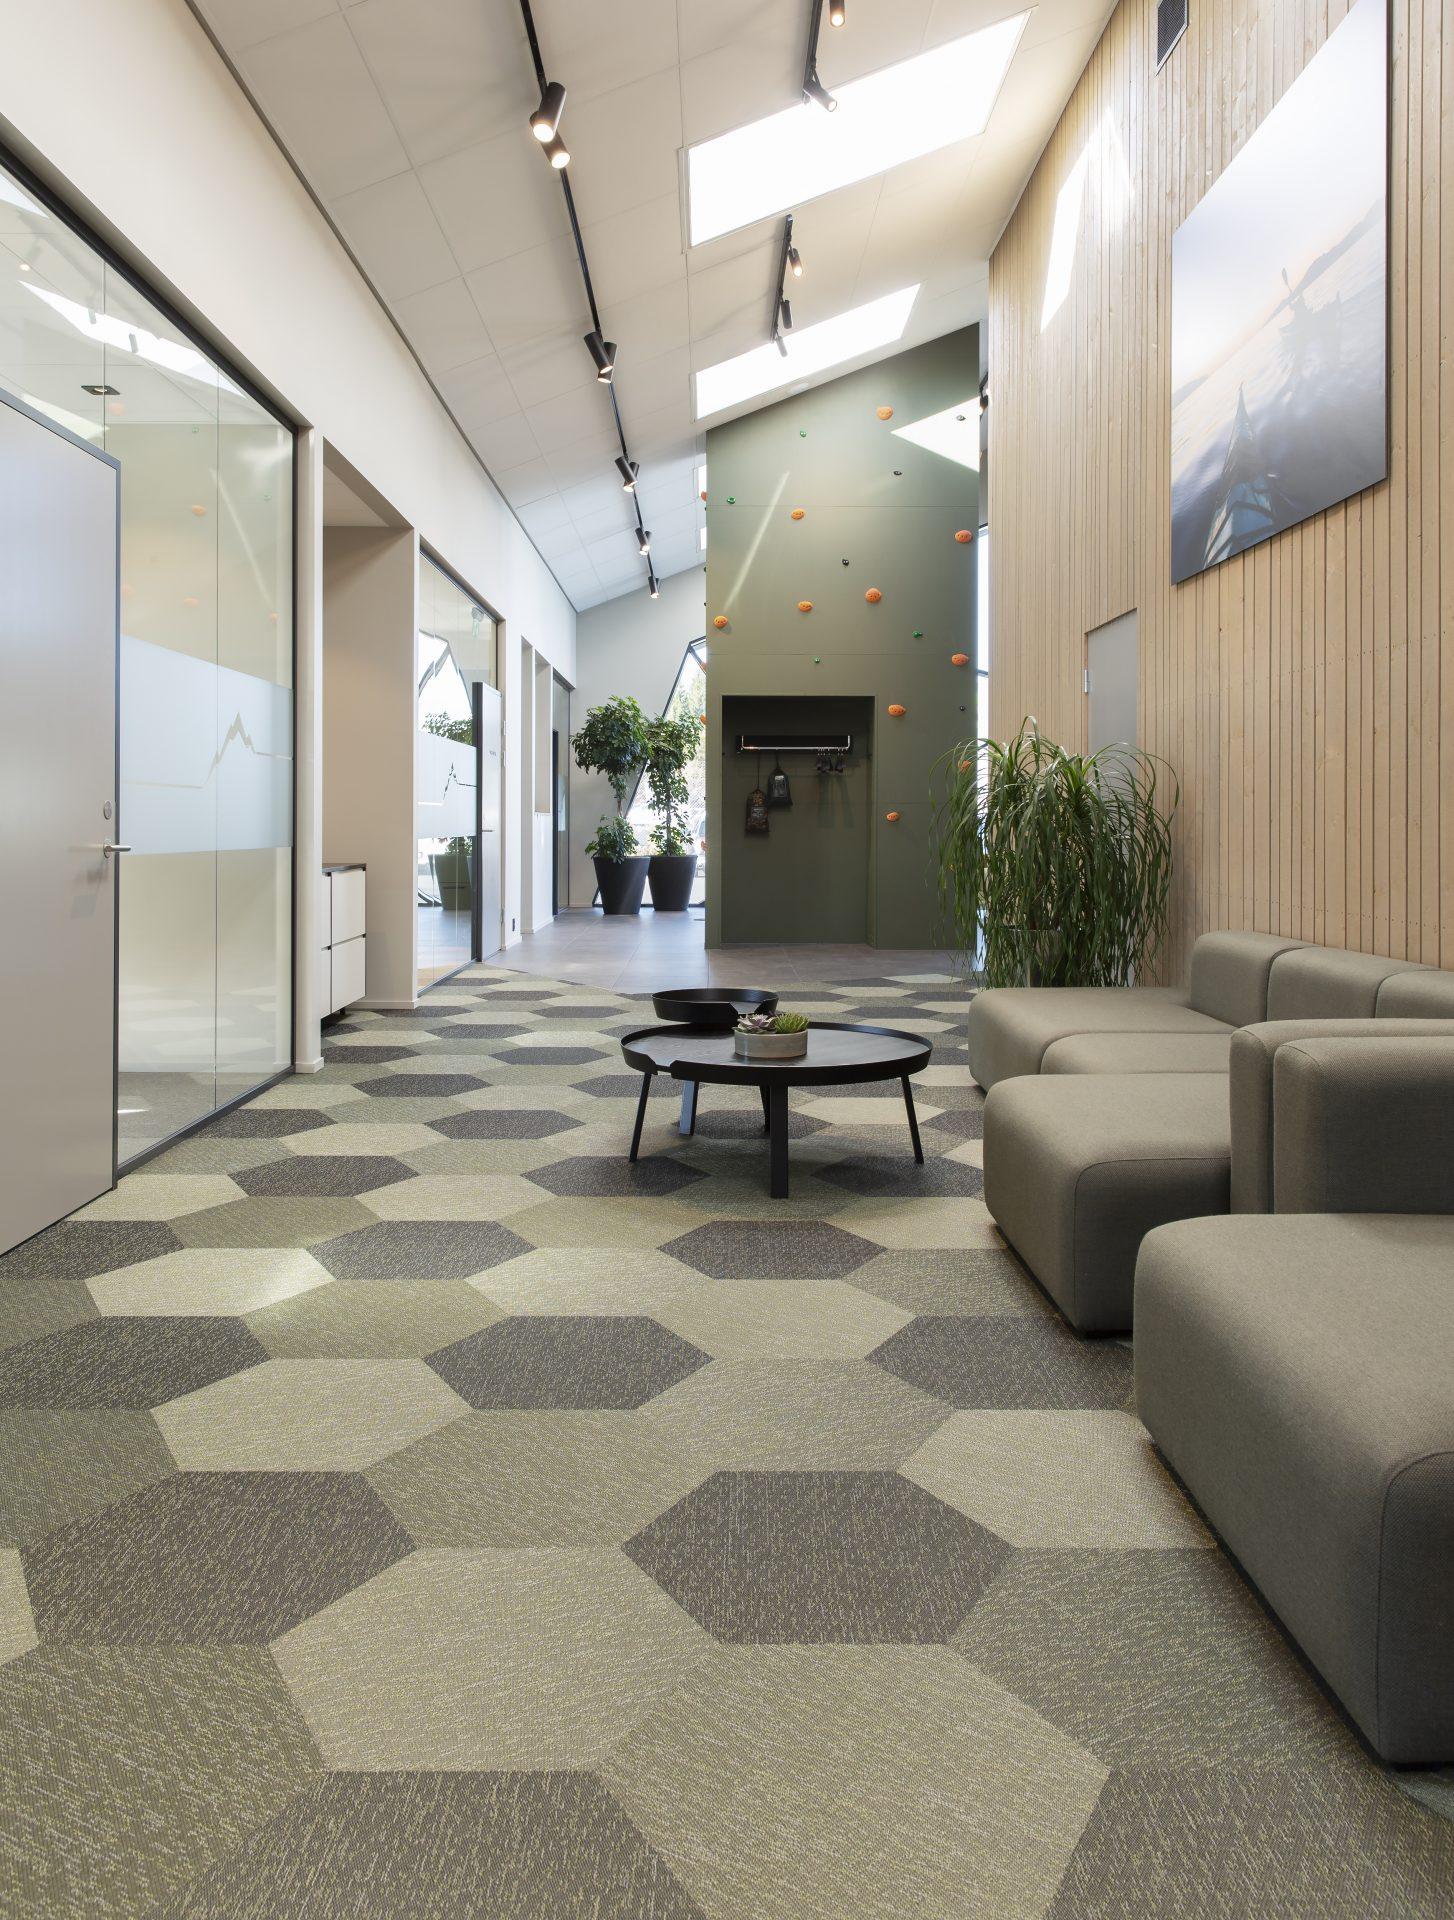 Orbital-Office-2018-Hekta-P-Tur-NO-Oslo-03